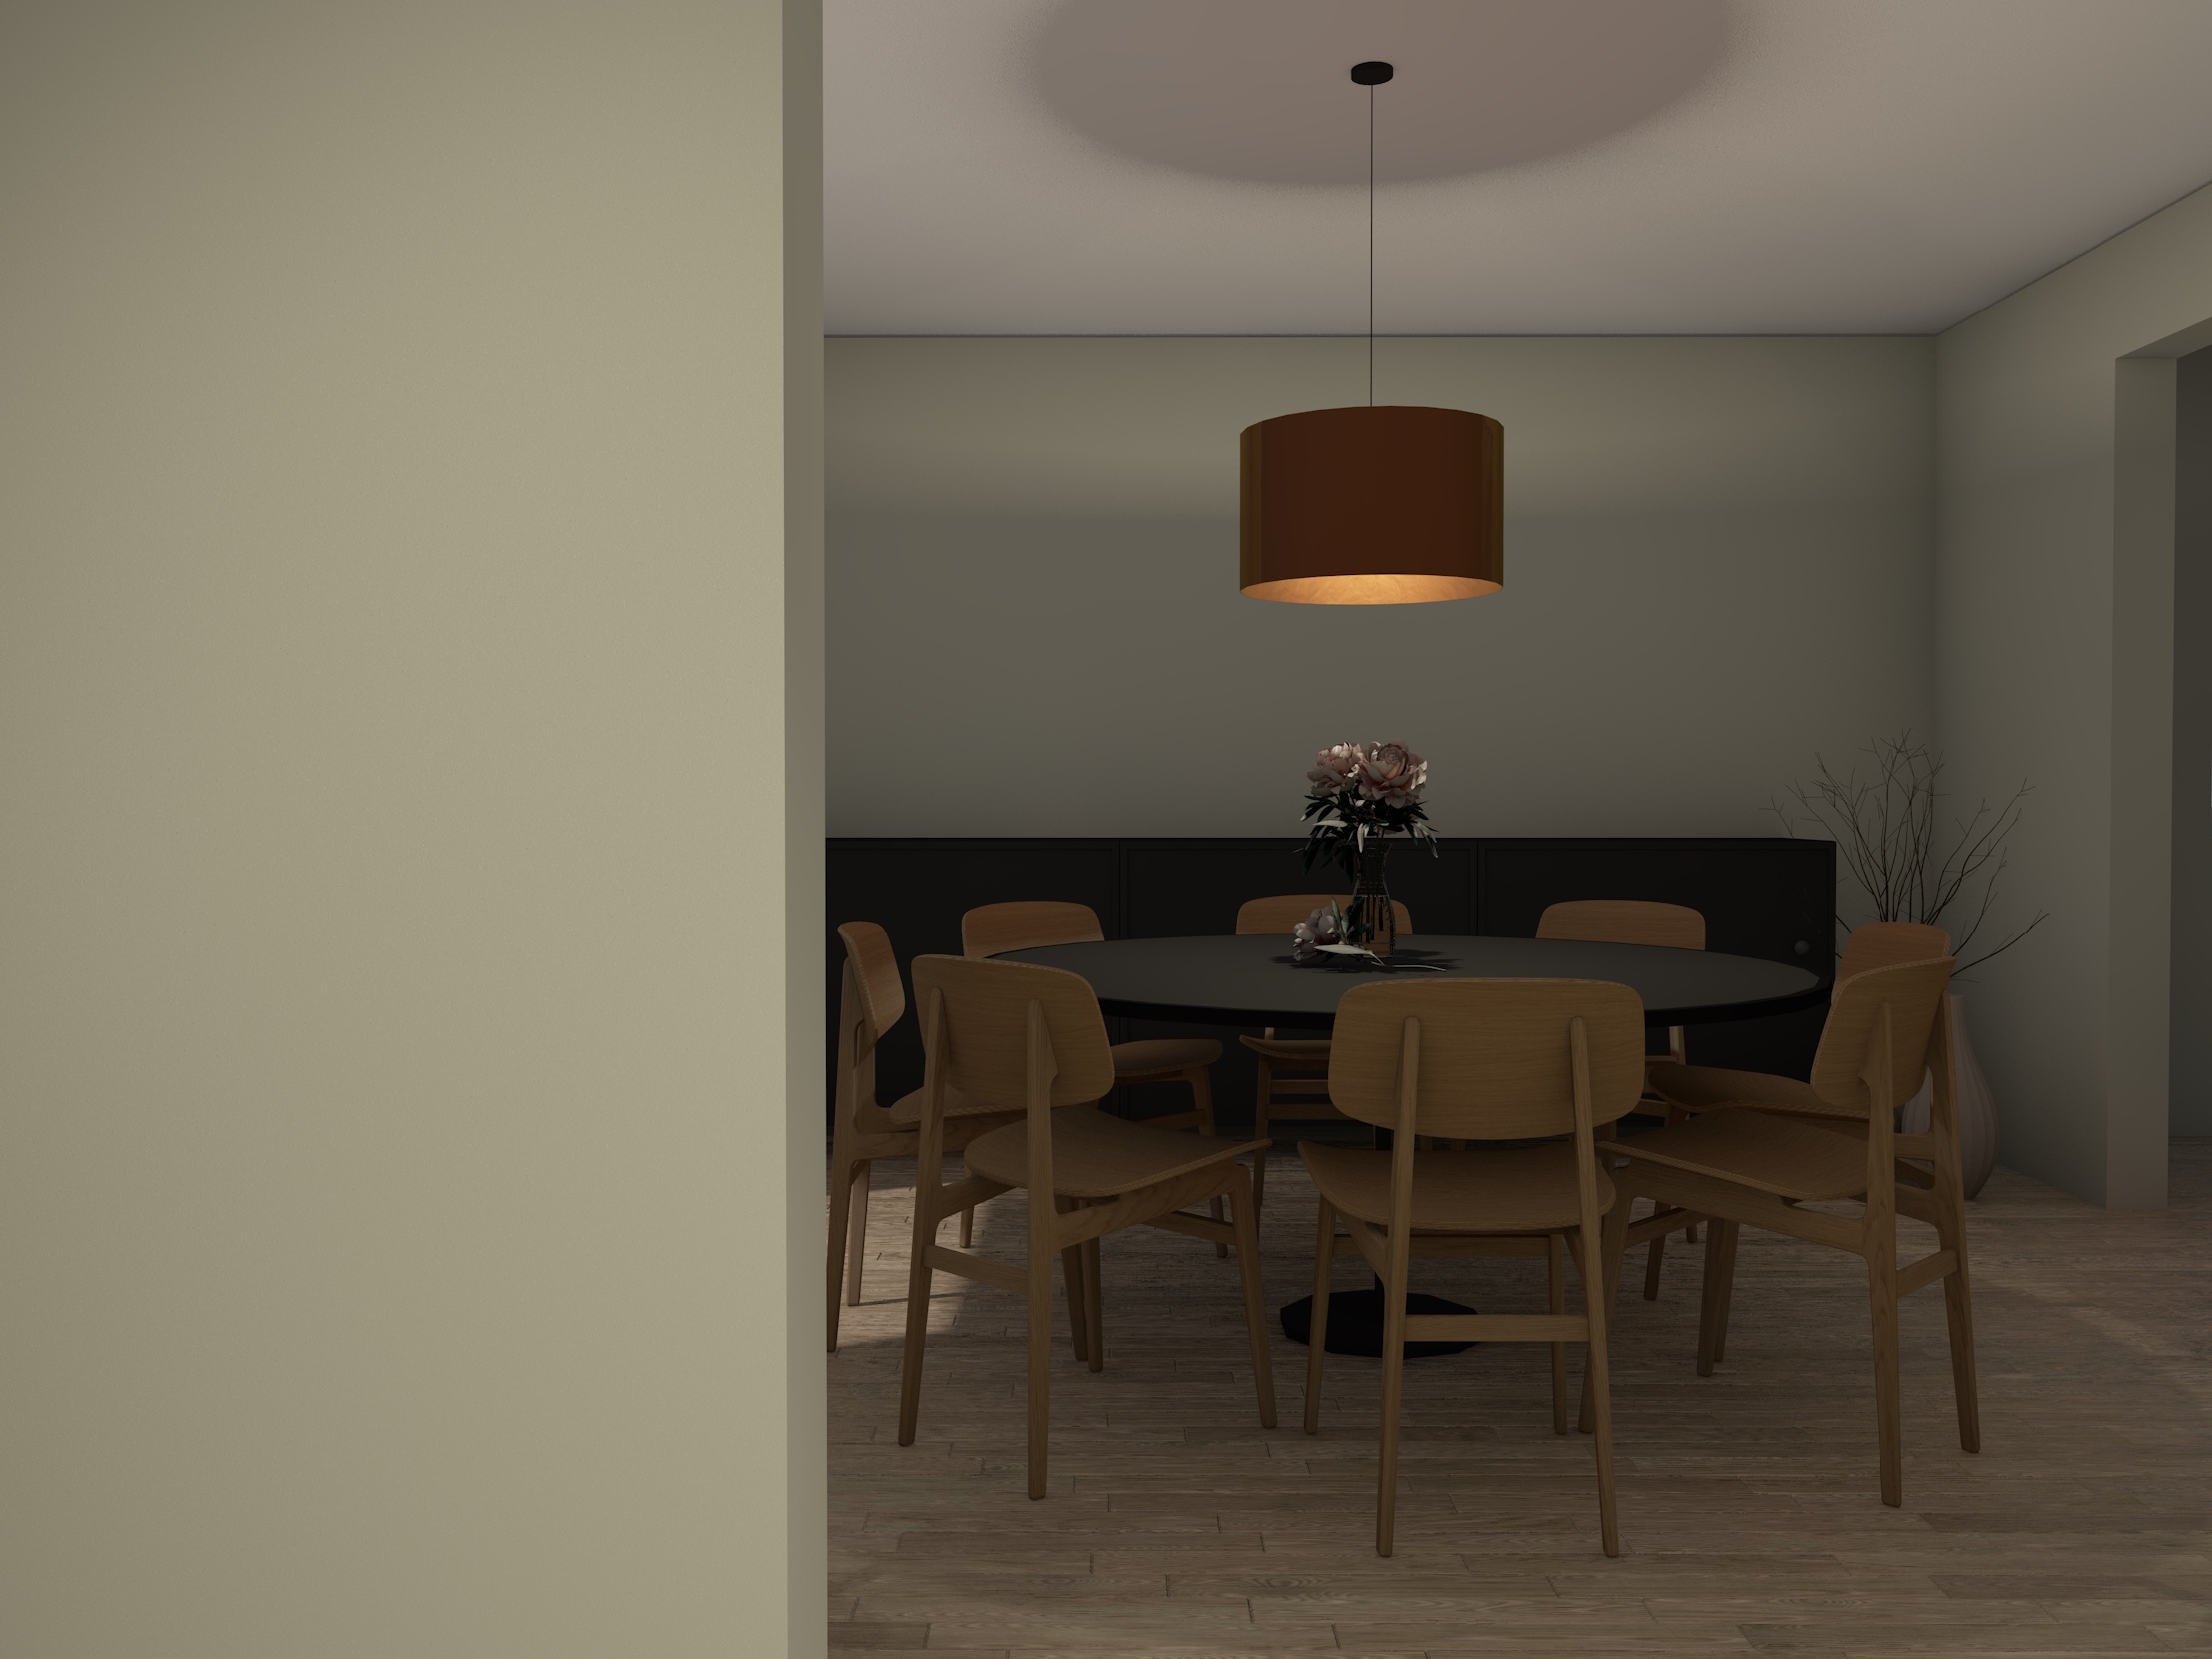 Spisestue med stoler og belysning